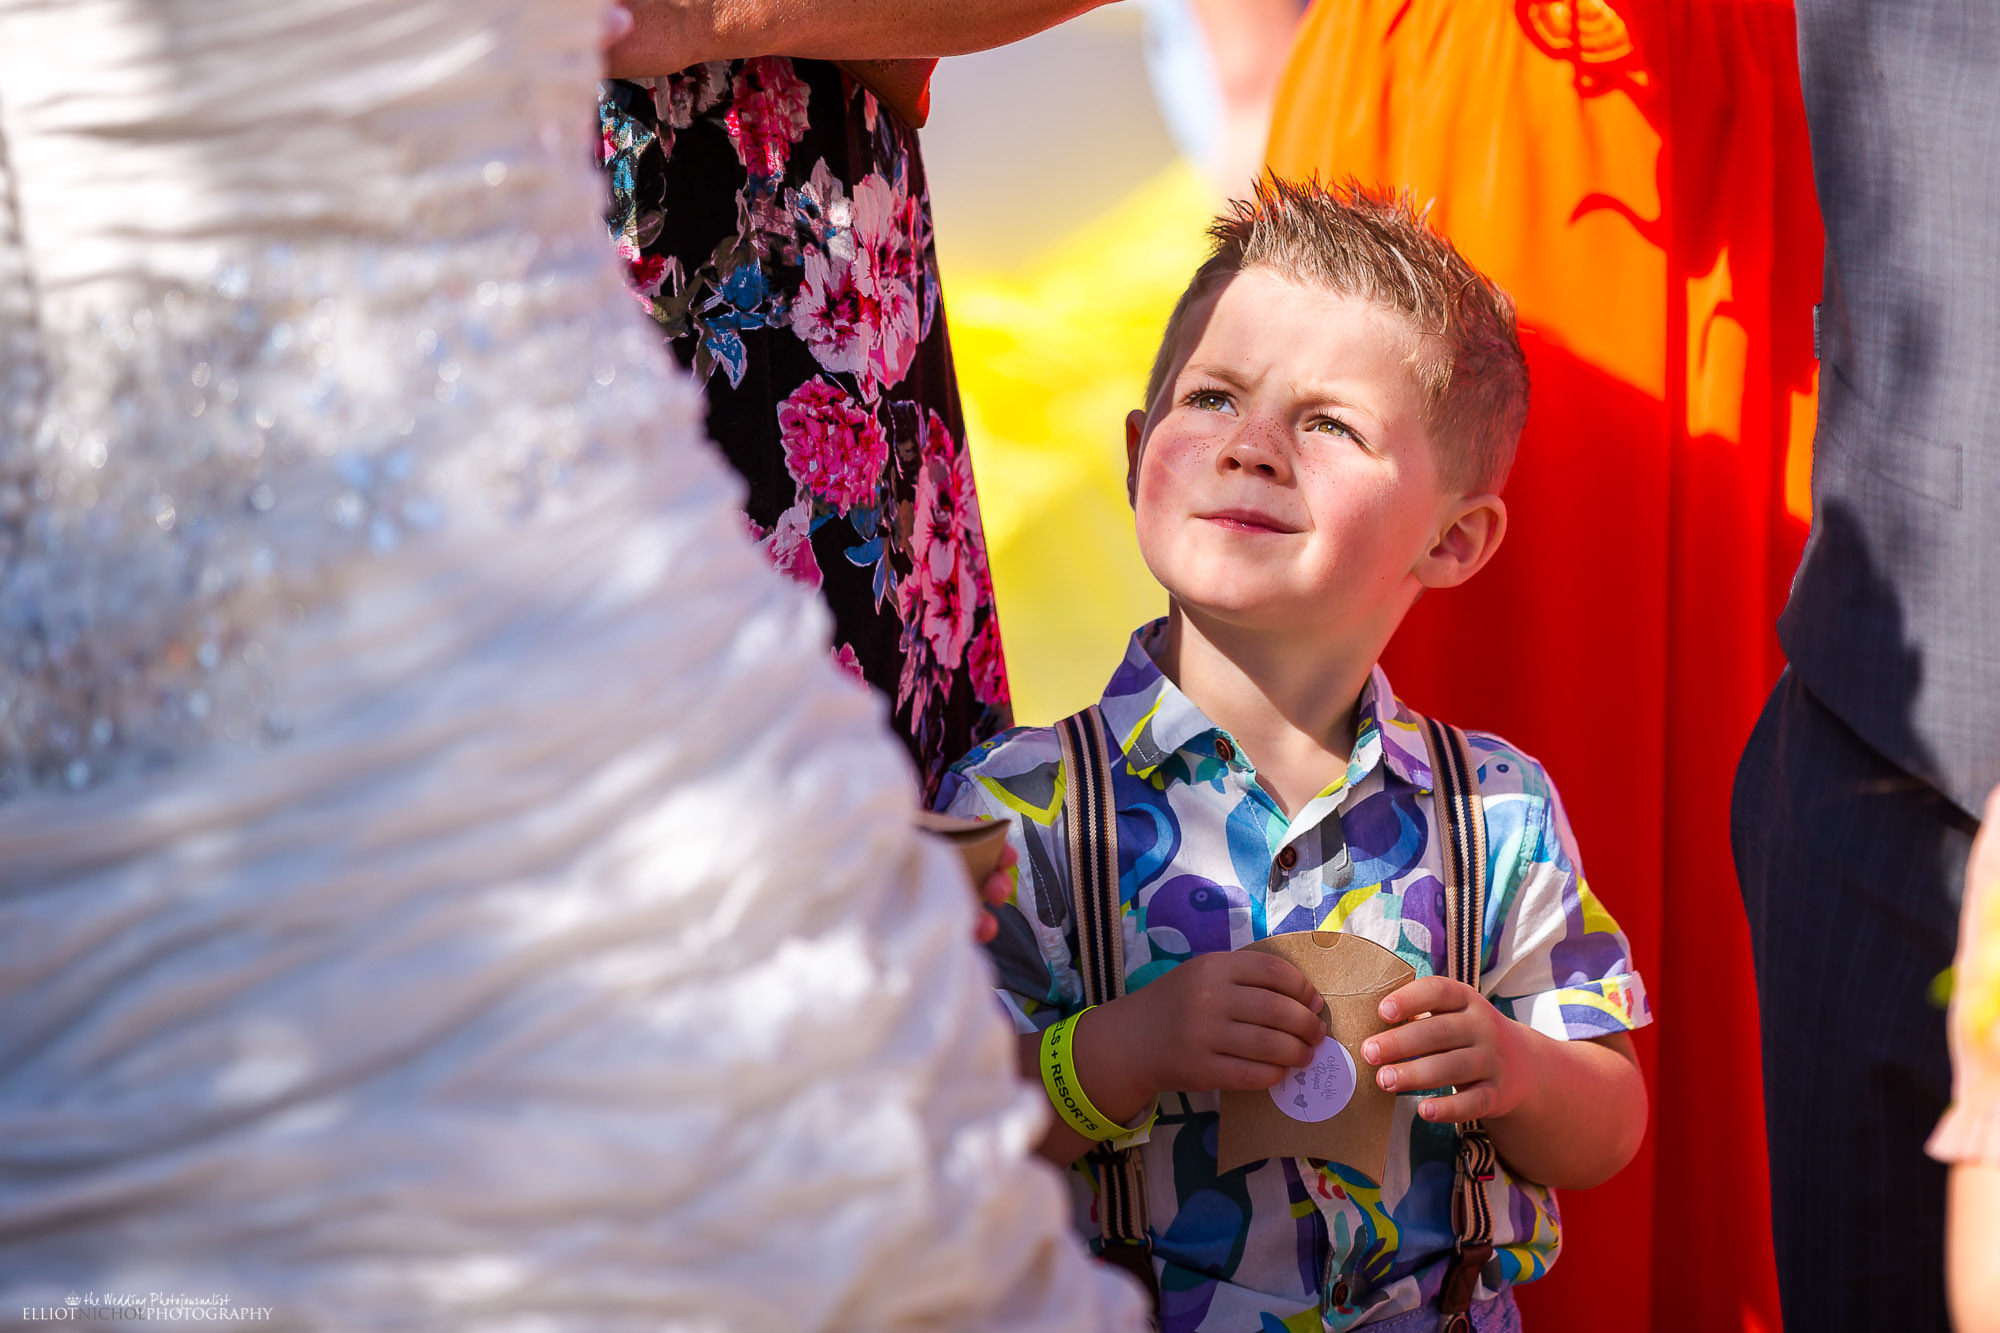 wedding-guest-small-child-destination-weddings